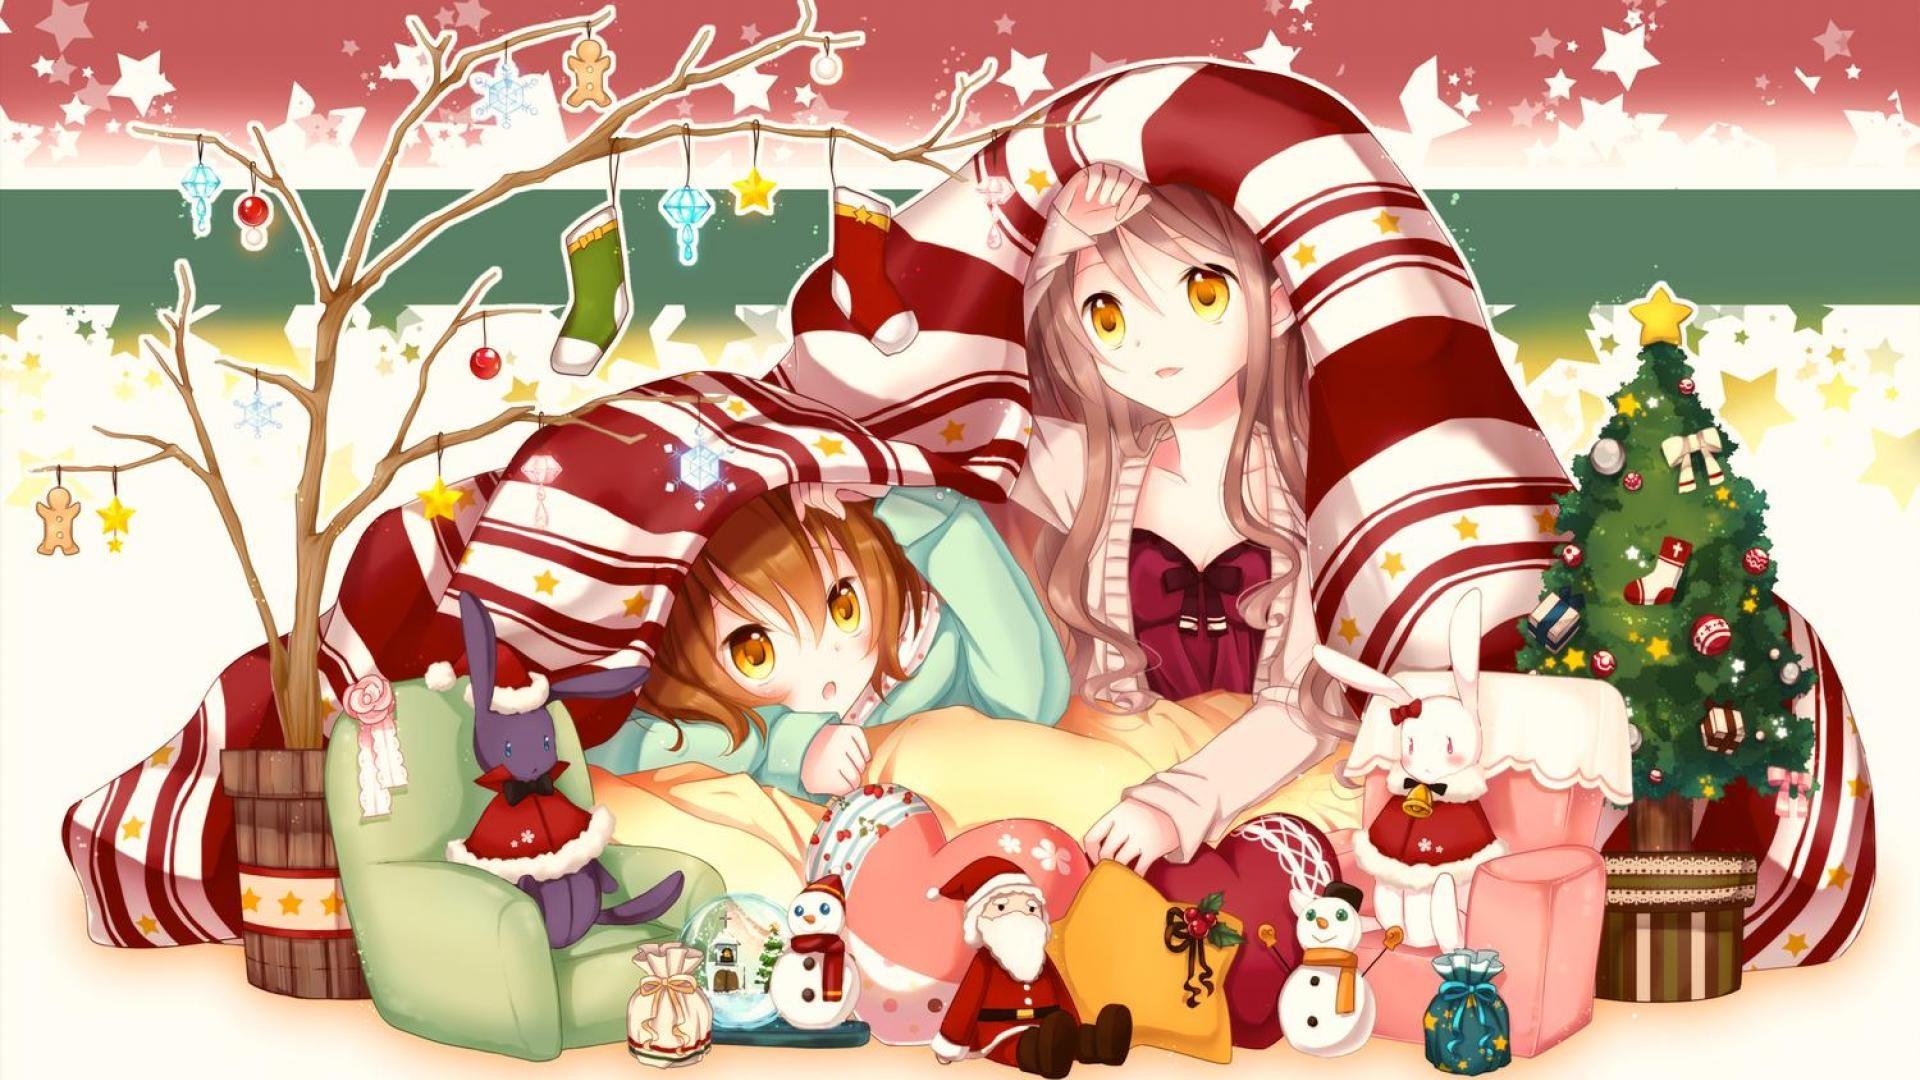 Anime Christmas Wallpapers Free download.